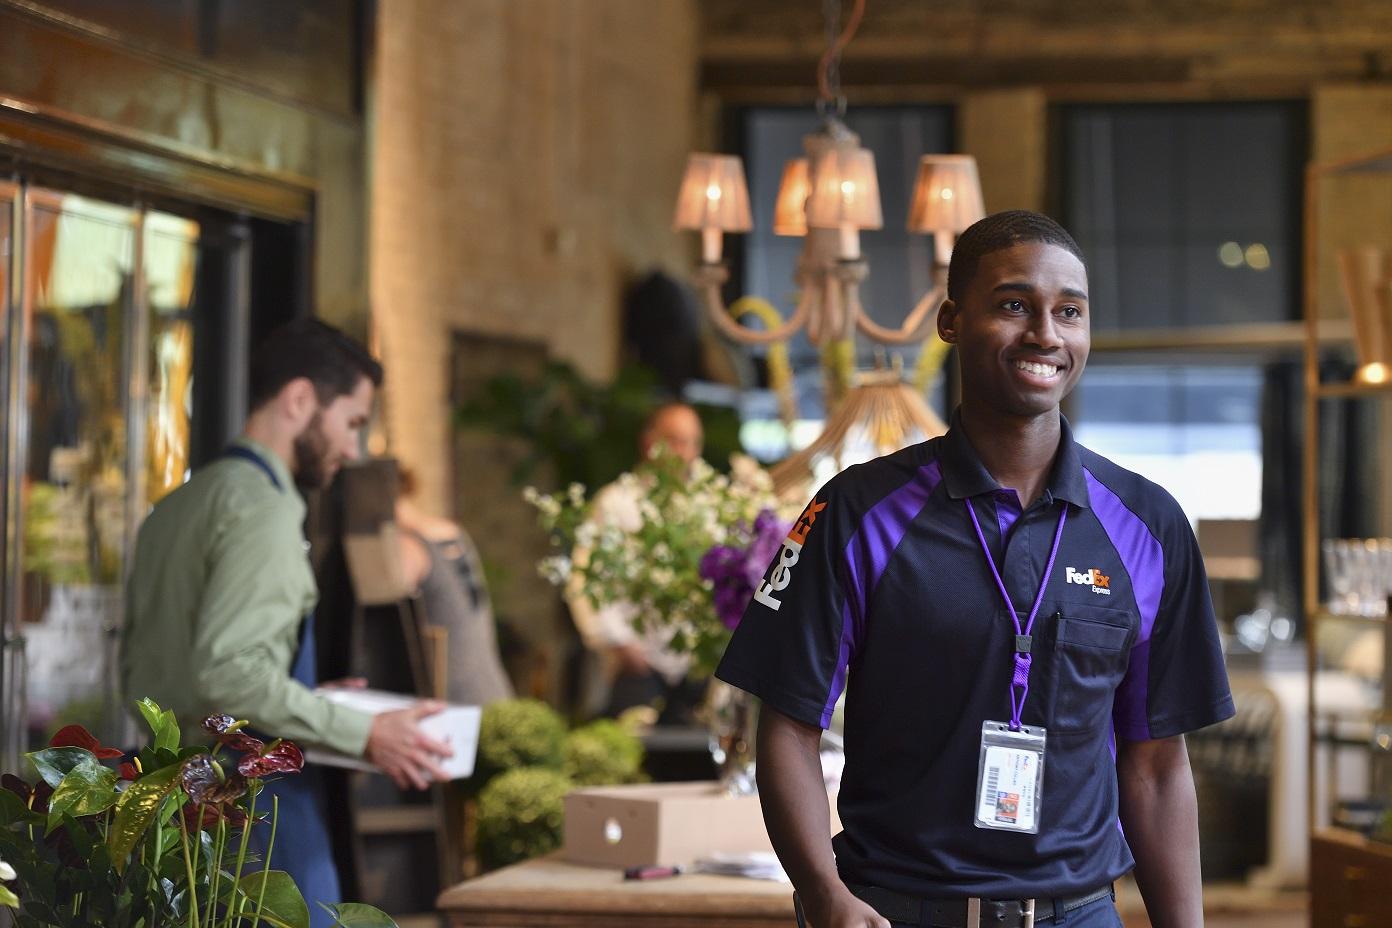 FedEx-100-best-companies-hiring